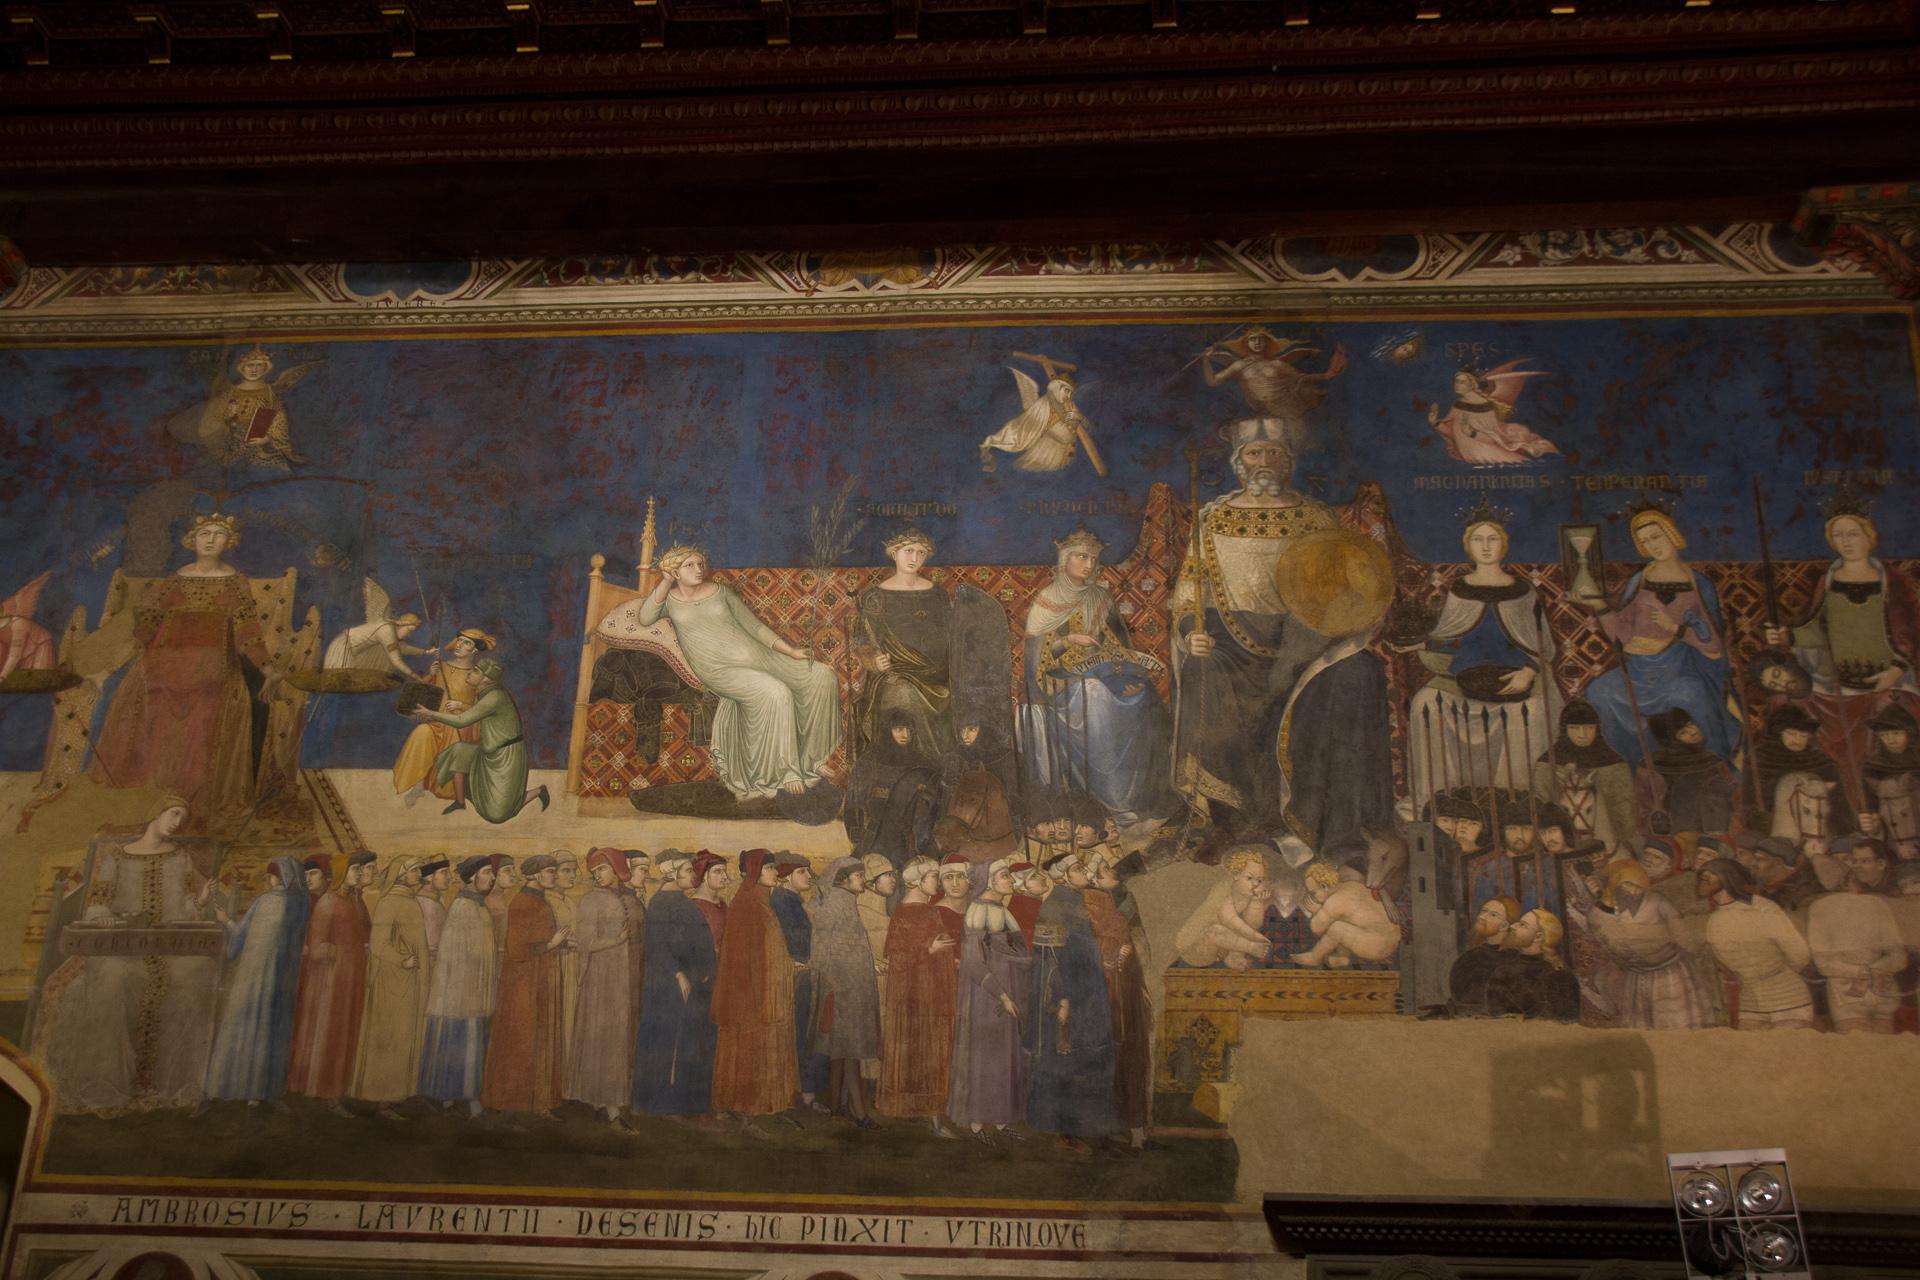 Trip Report – RTW – Part 7: Italy Day 1: Siena